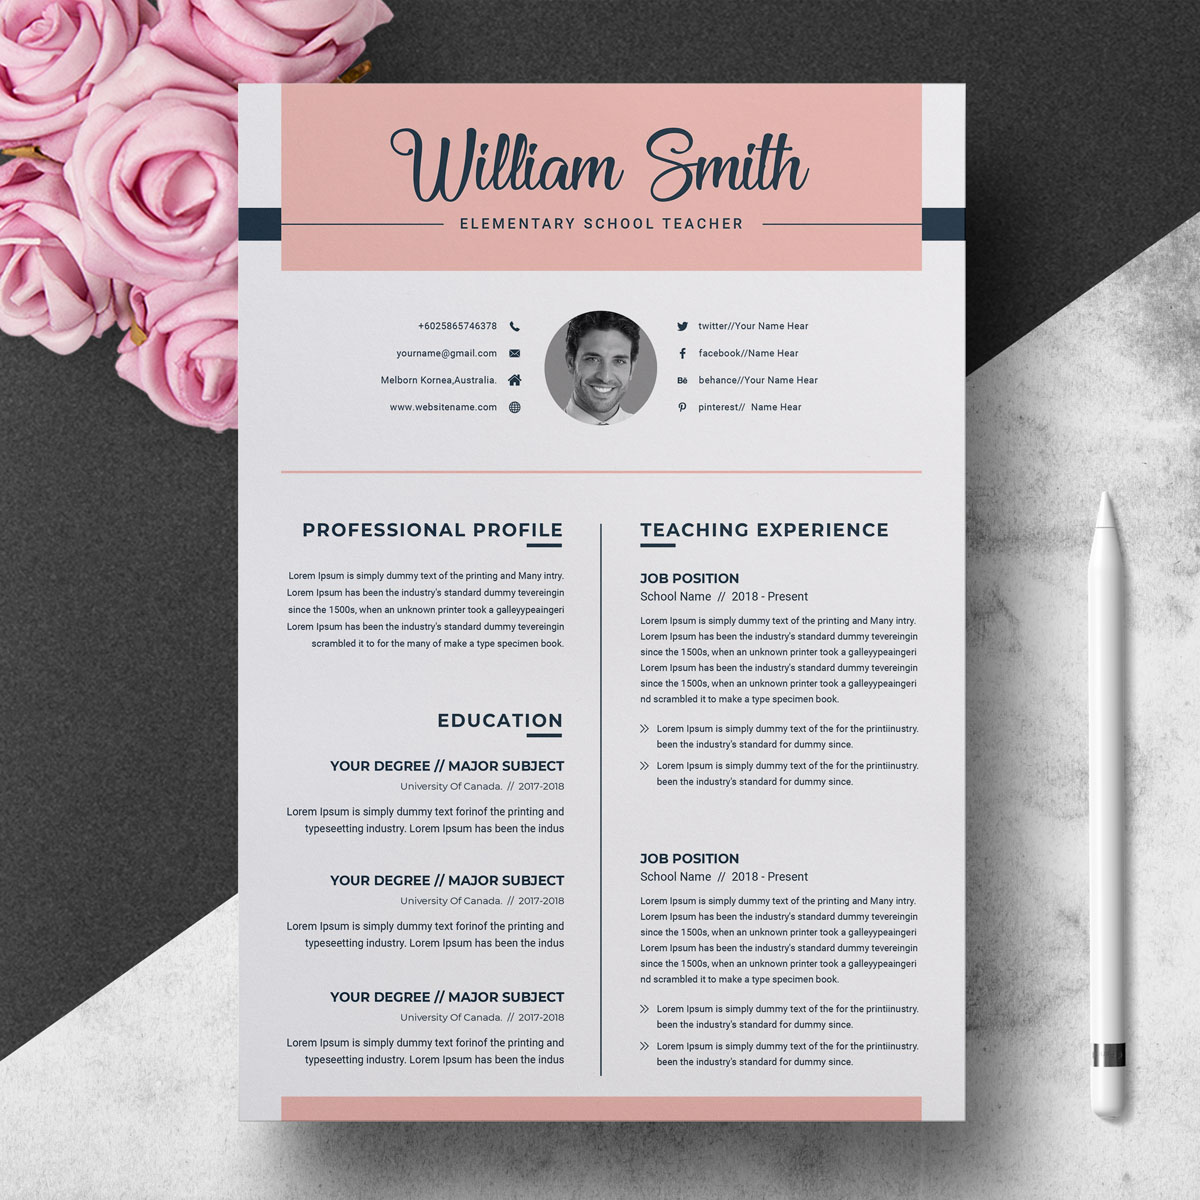 william smith resume template  73914